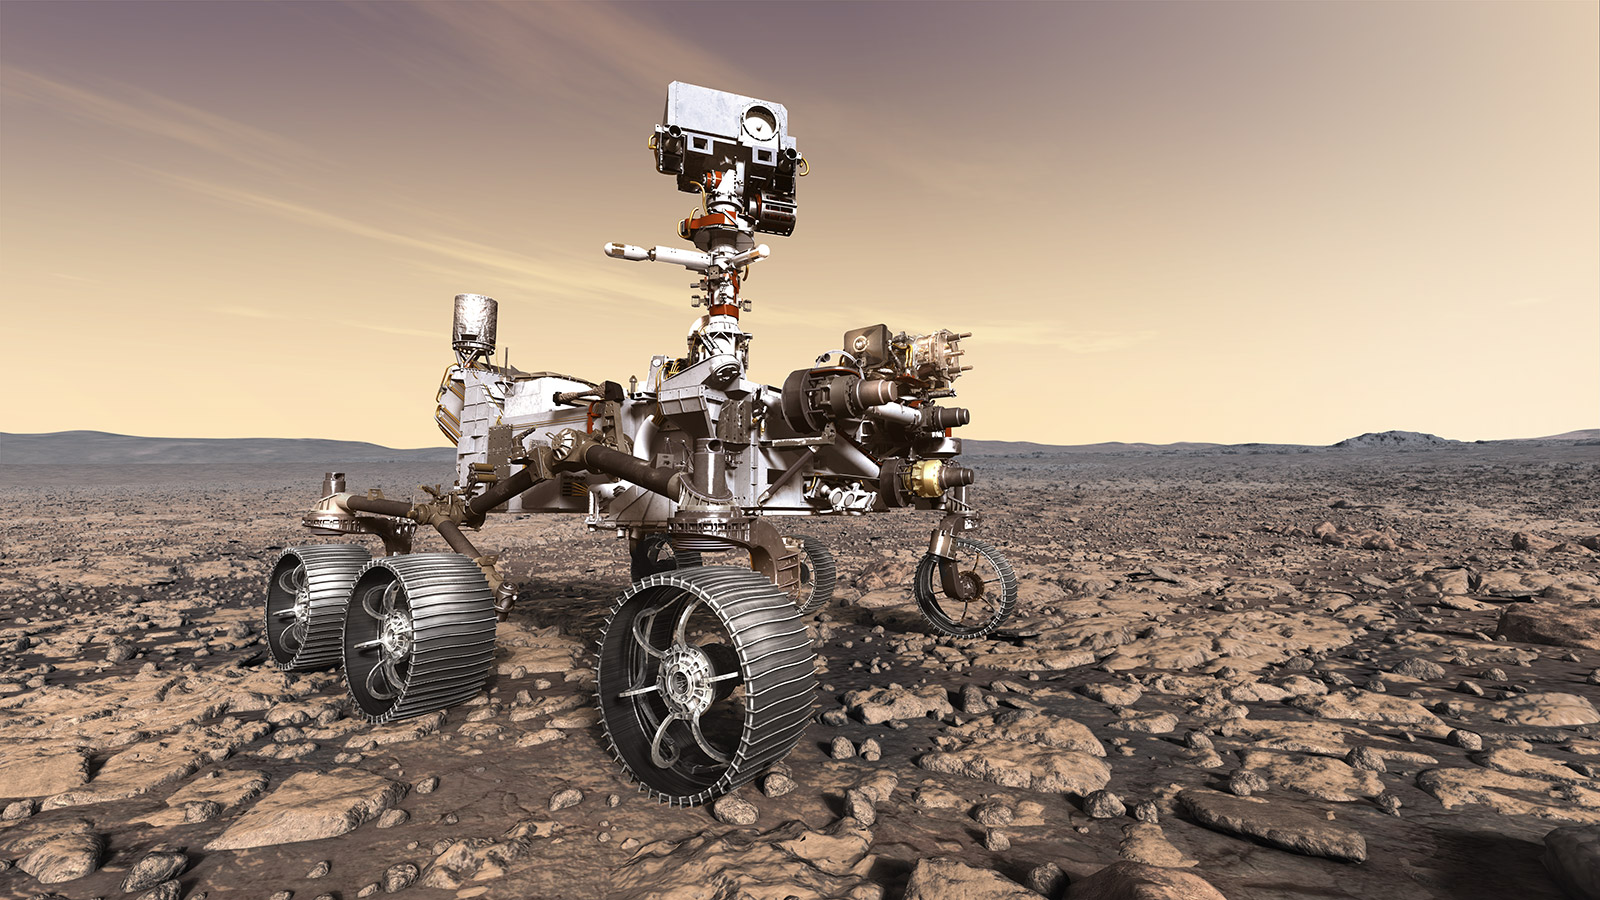 Mars 2020 Rover – NASA's Mars Exploration Program